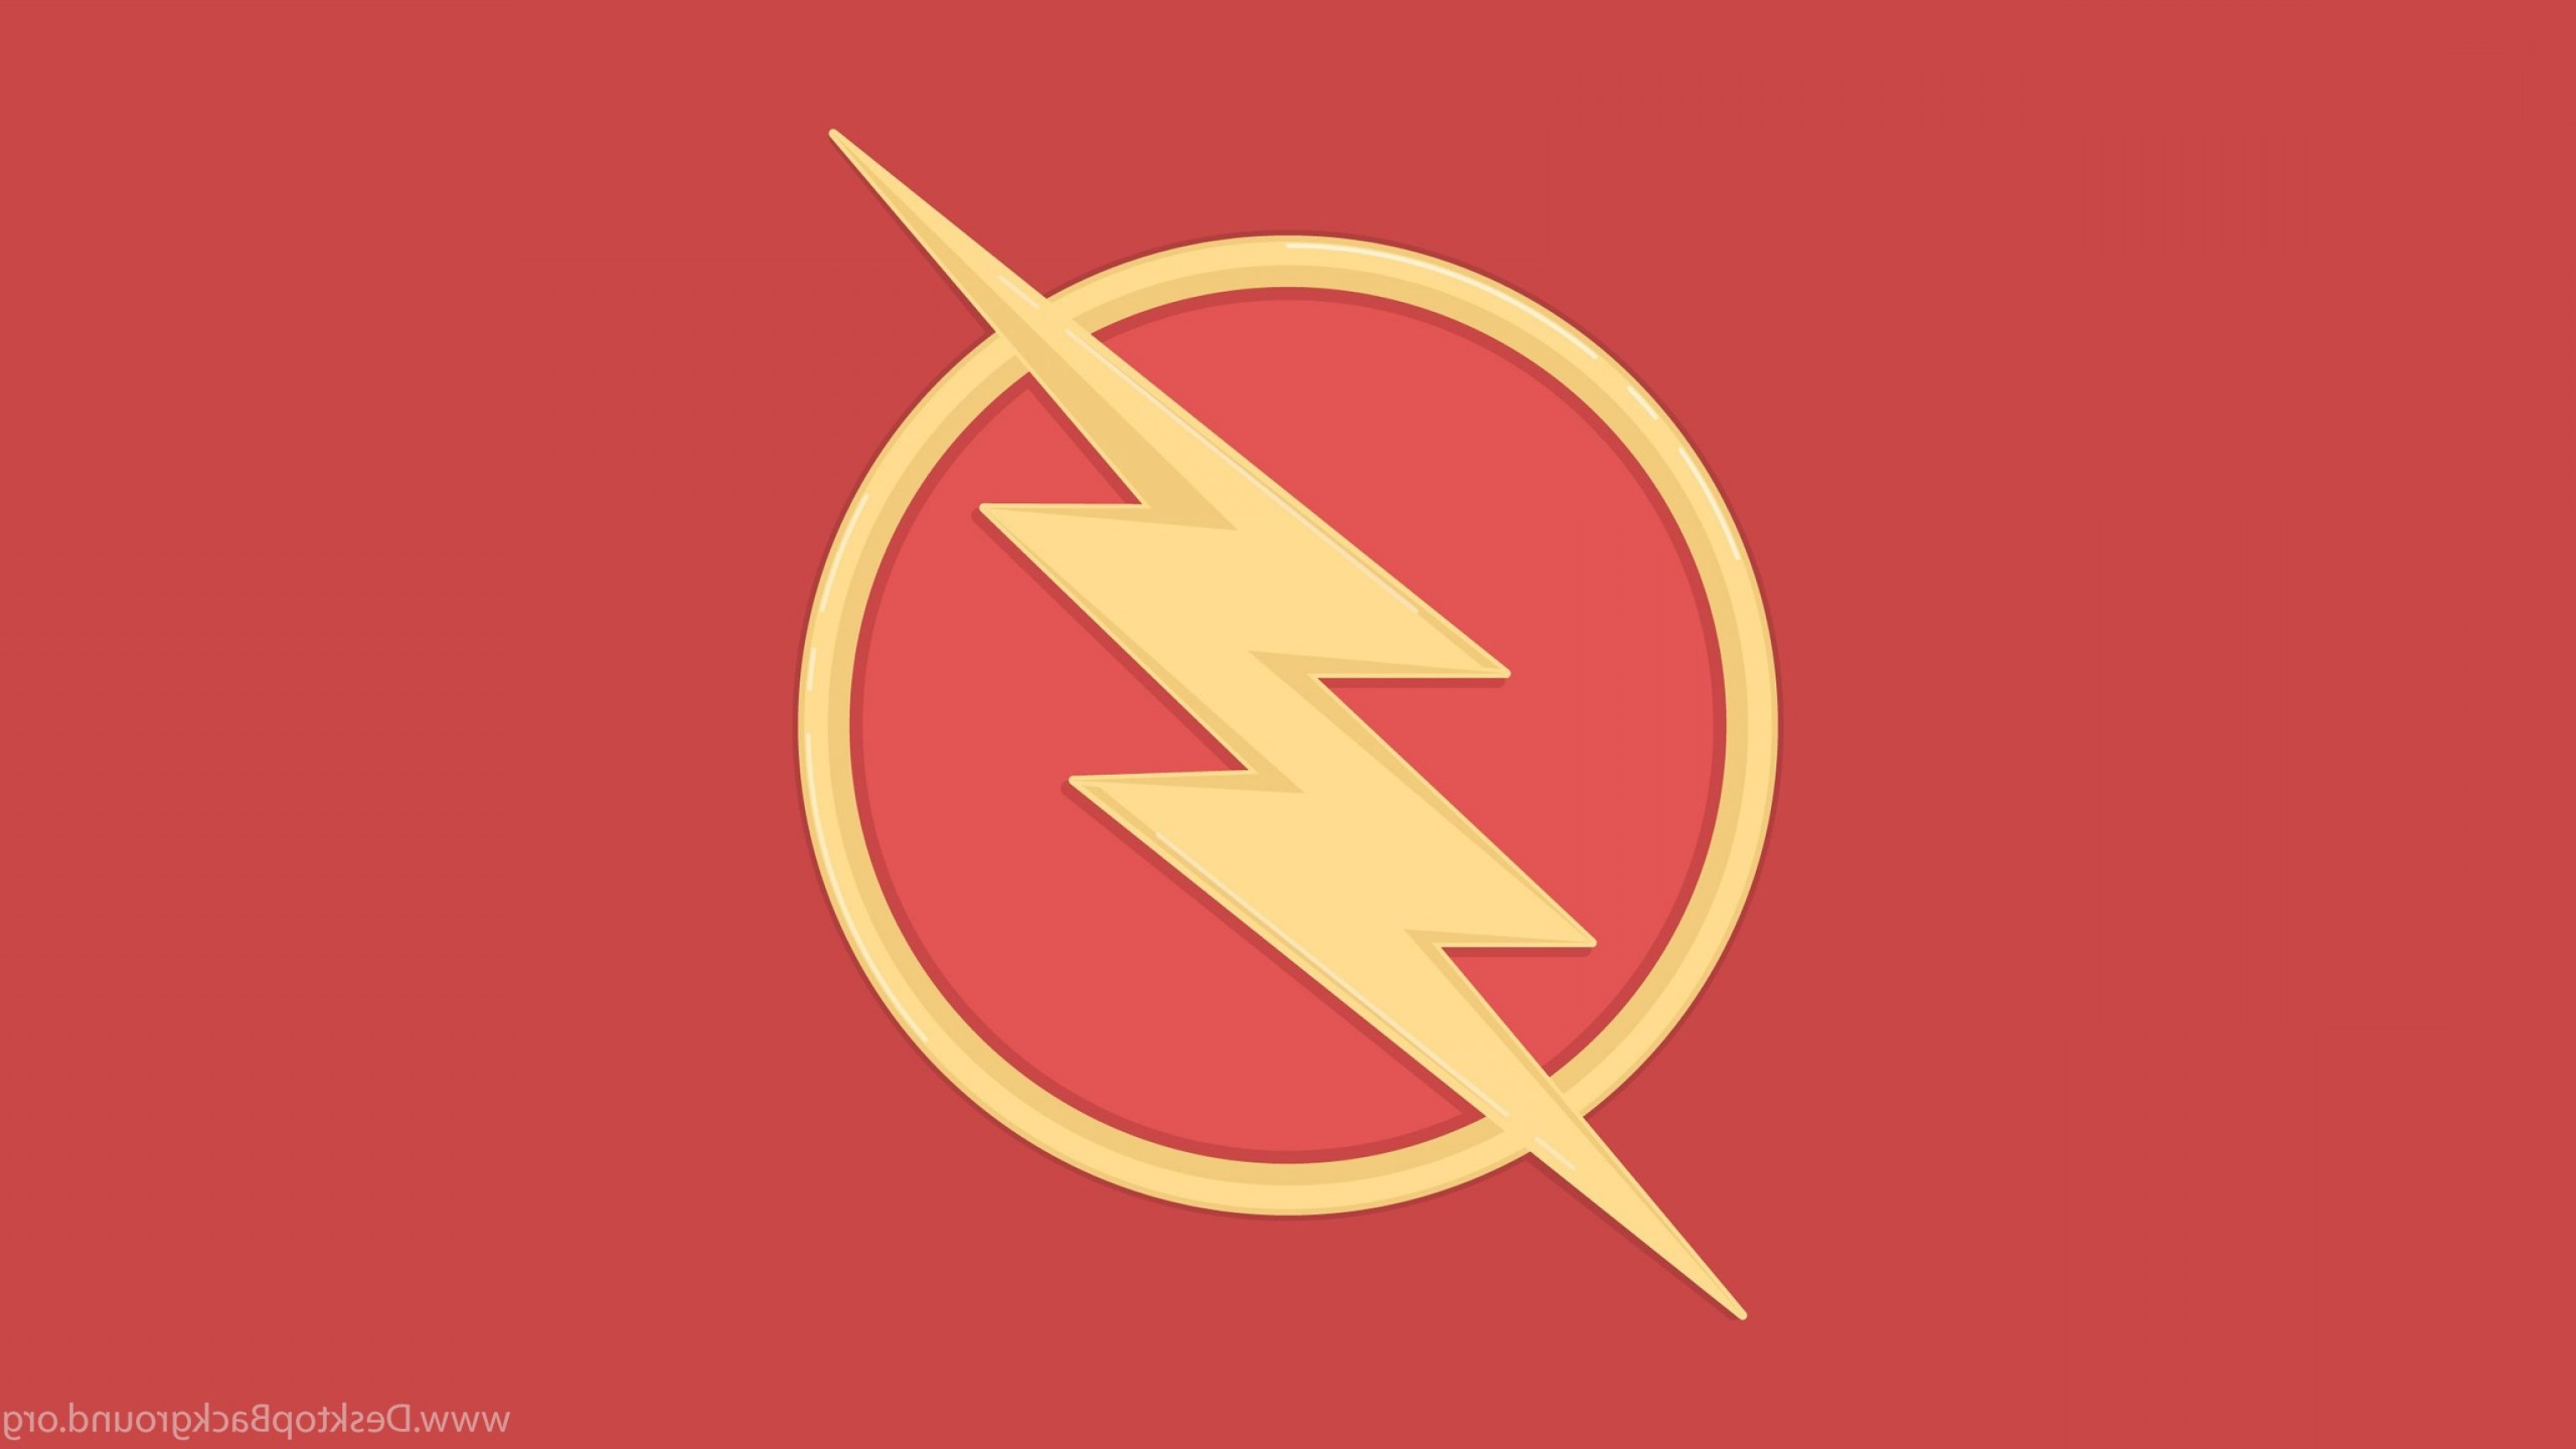 3072x1728 The Flash Logo Vector Wallpapers Shopatcloth